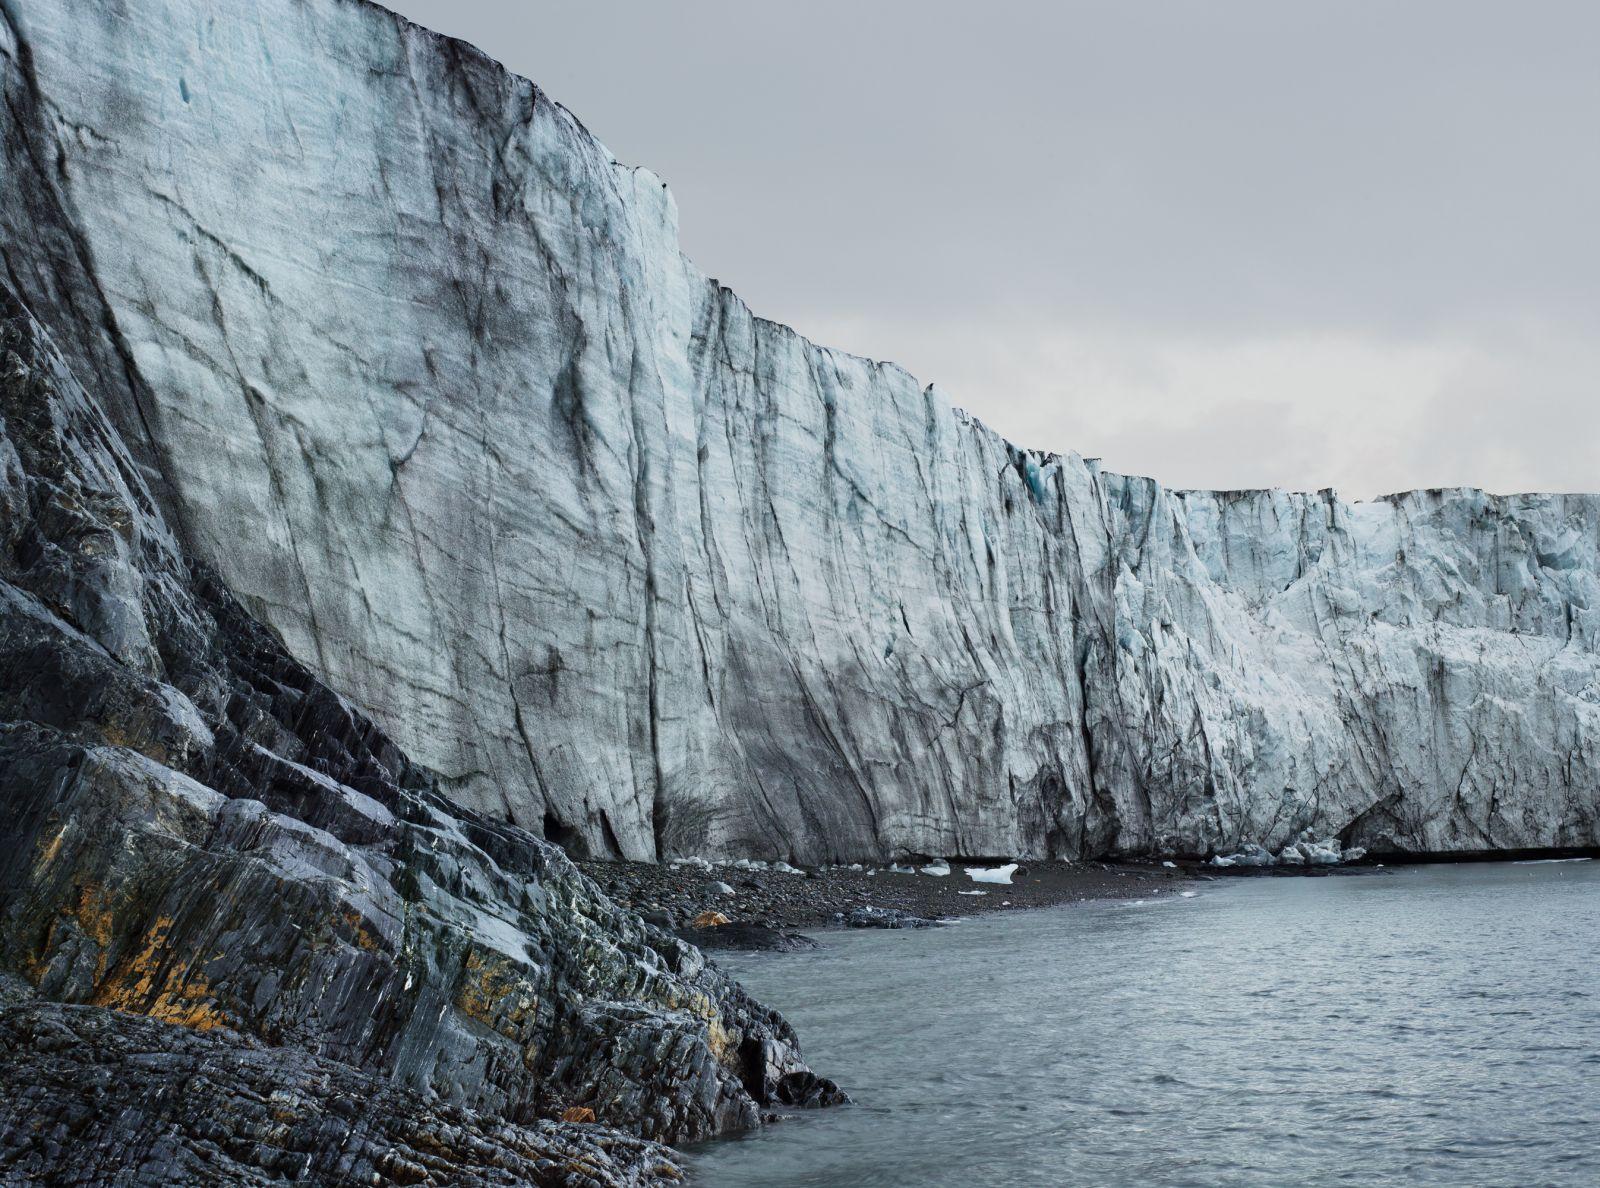 Panthalassa-CoreyArnold-iceberg-svalbard